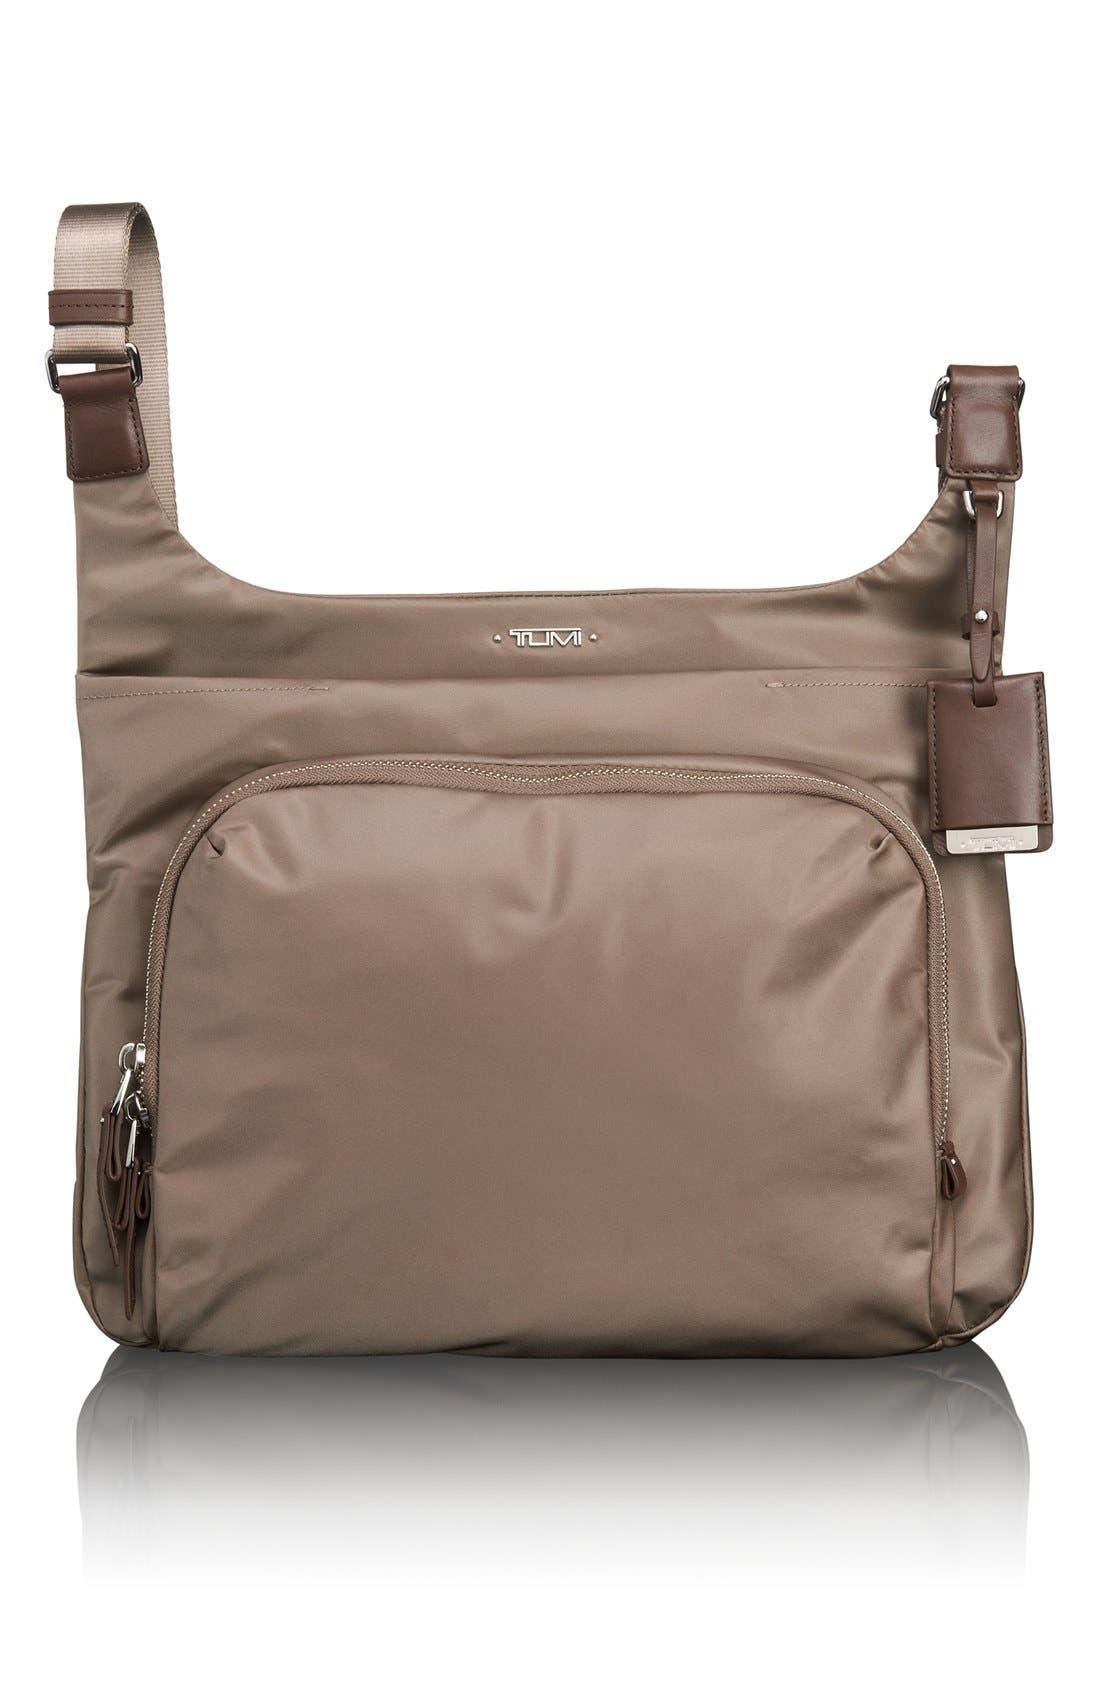 Alternate Image 1 Selected - Tumi 'Voyager - Sumatra' Crossbody Bag